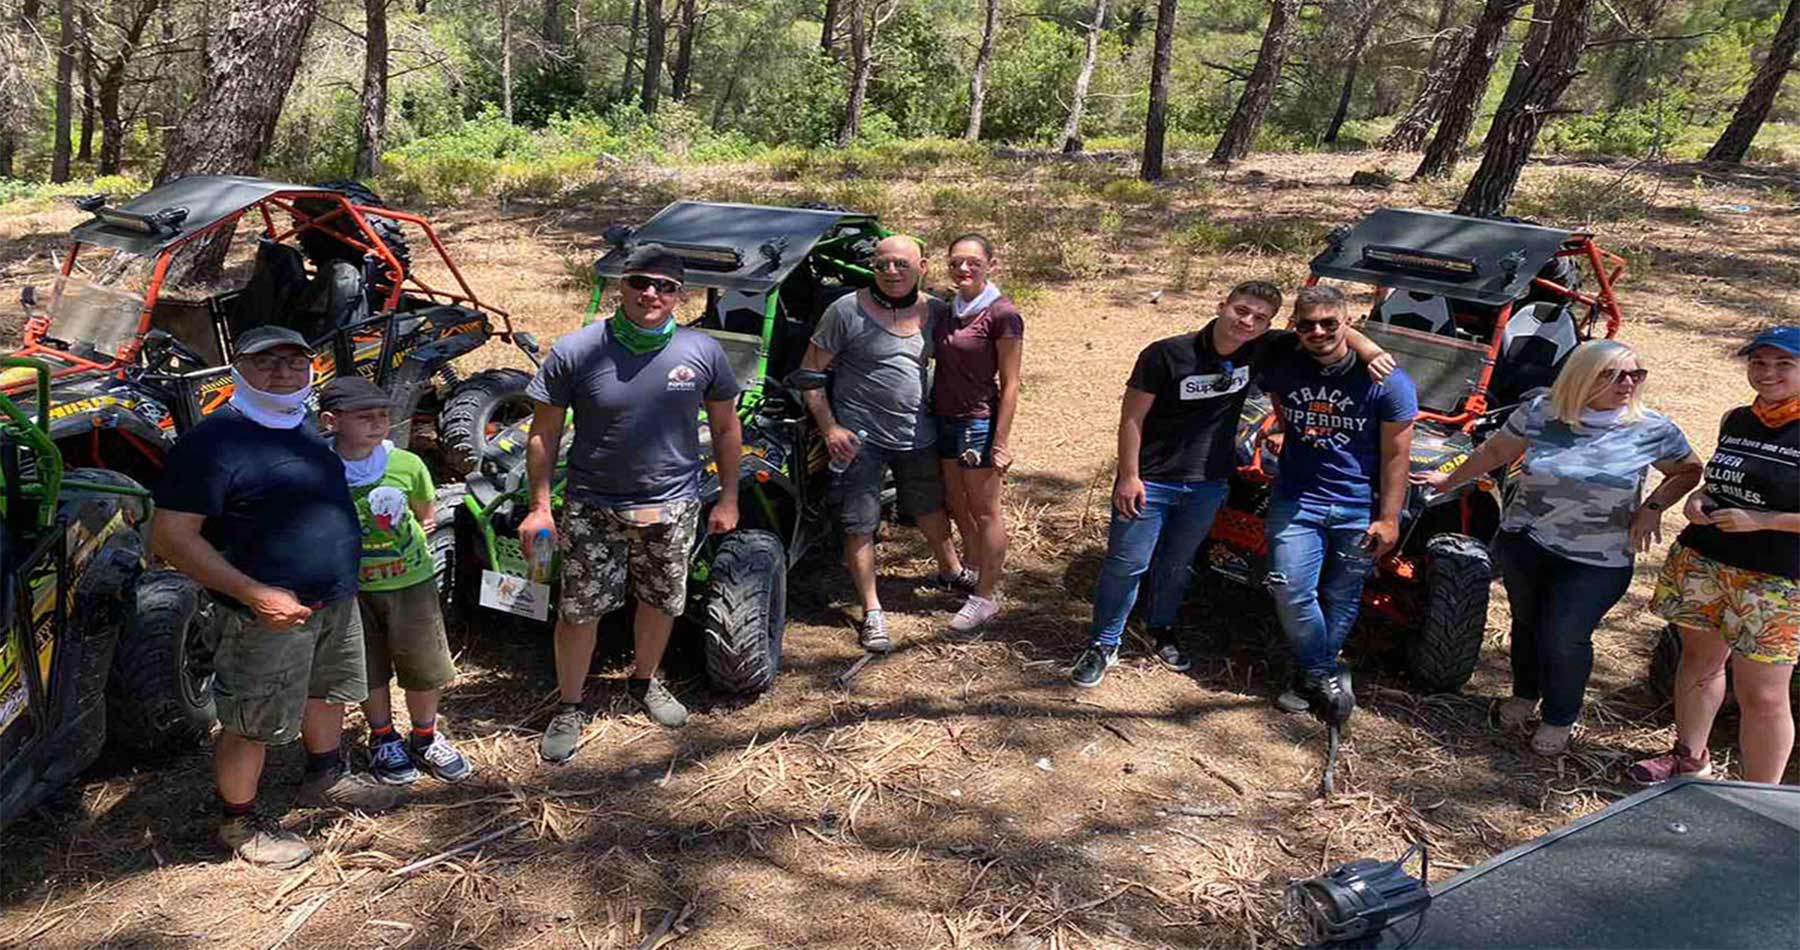 rhodes experience buggy safari 21